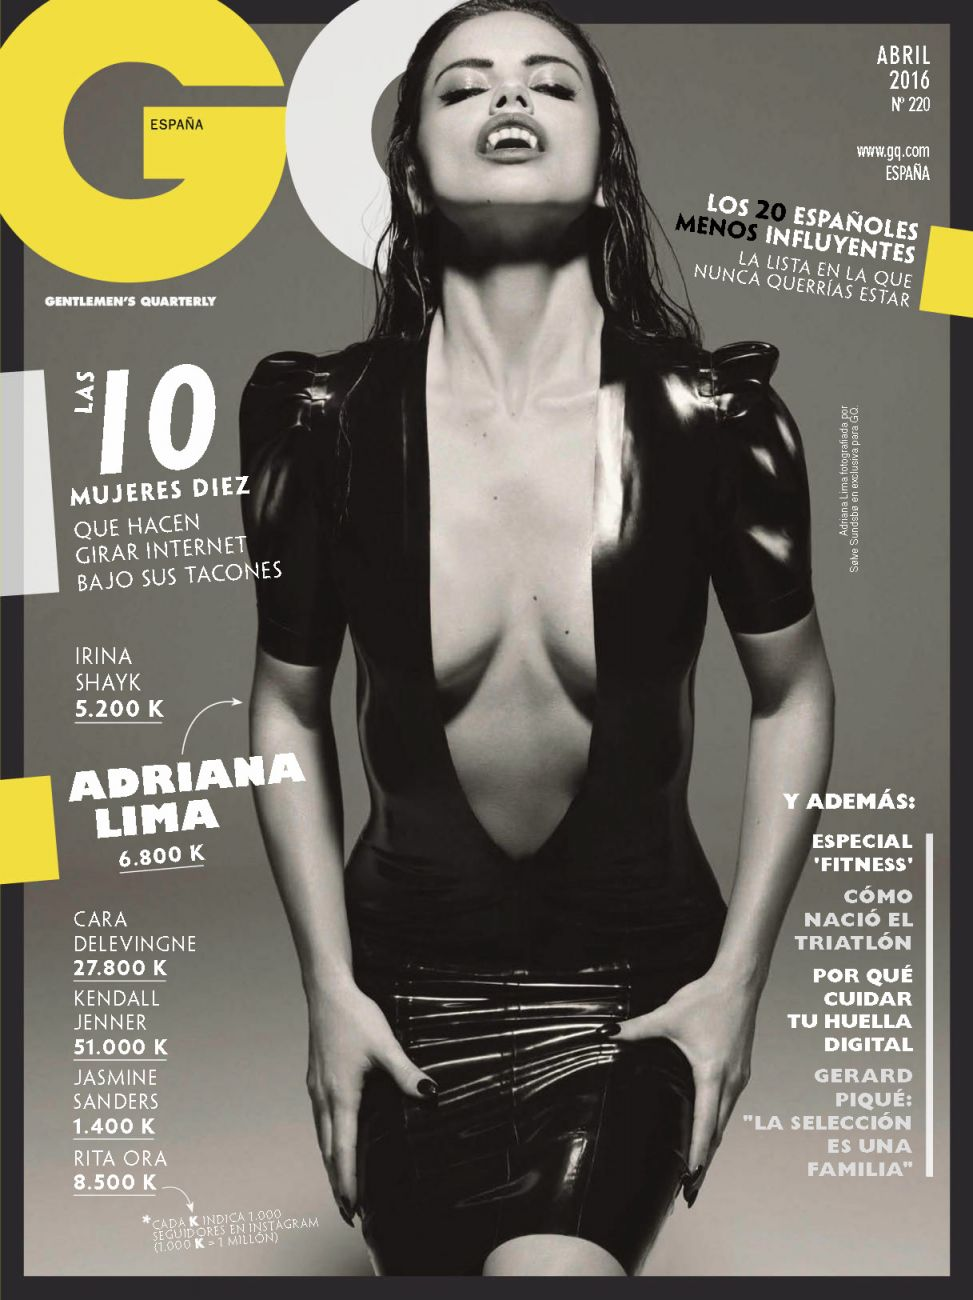 Adriana-Lima-Cleavage-1